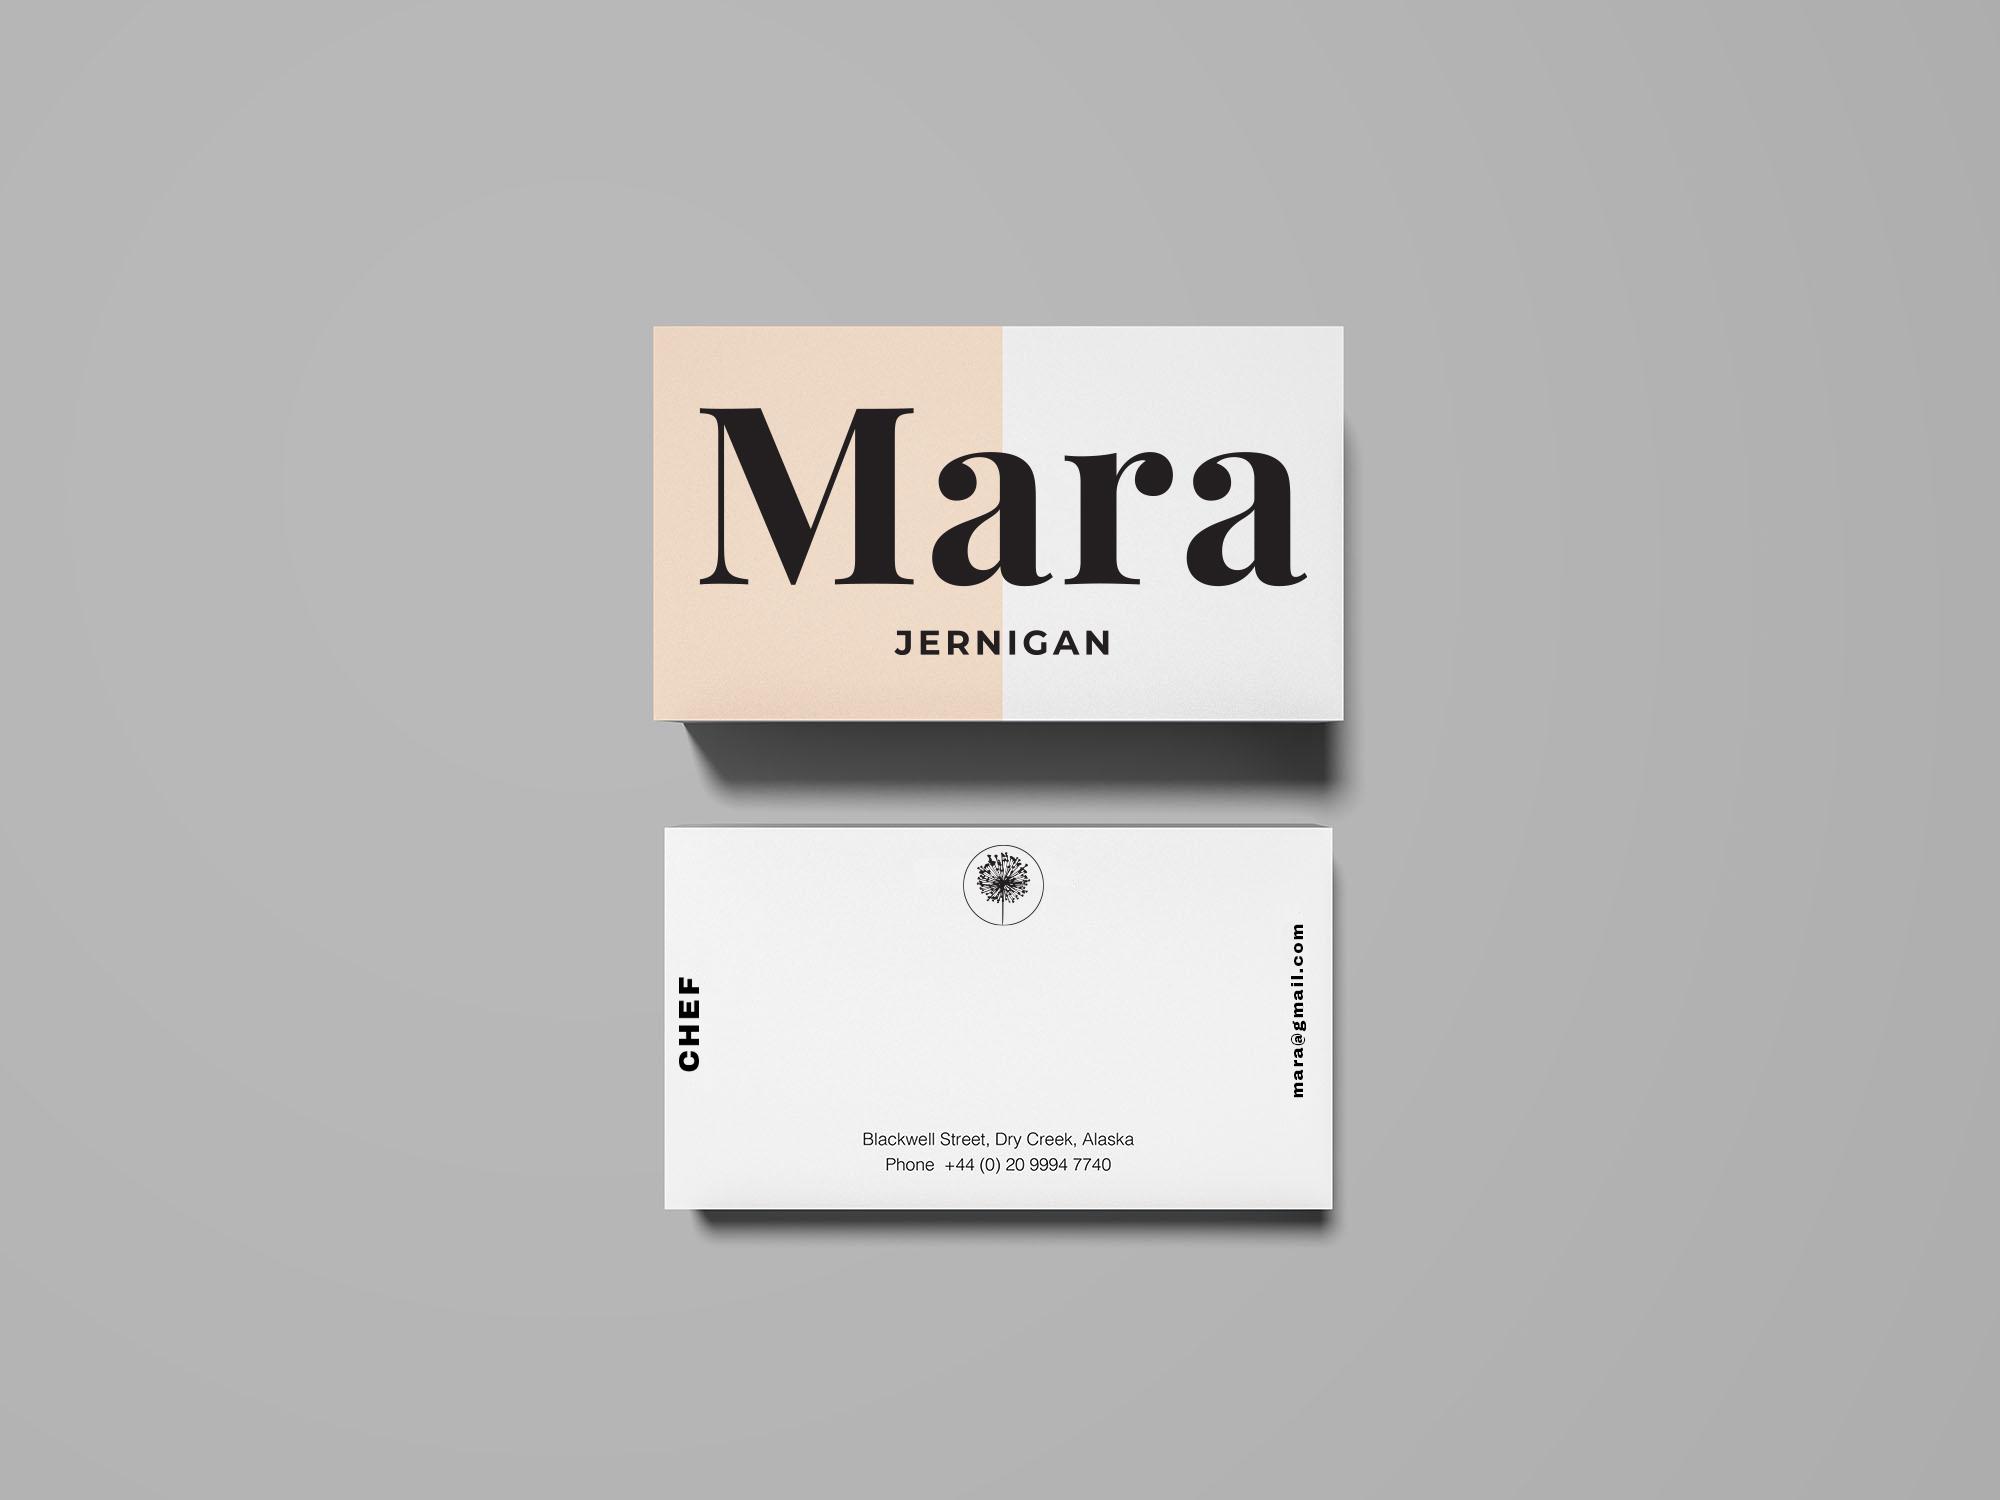 mara_businesscards.jpg